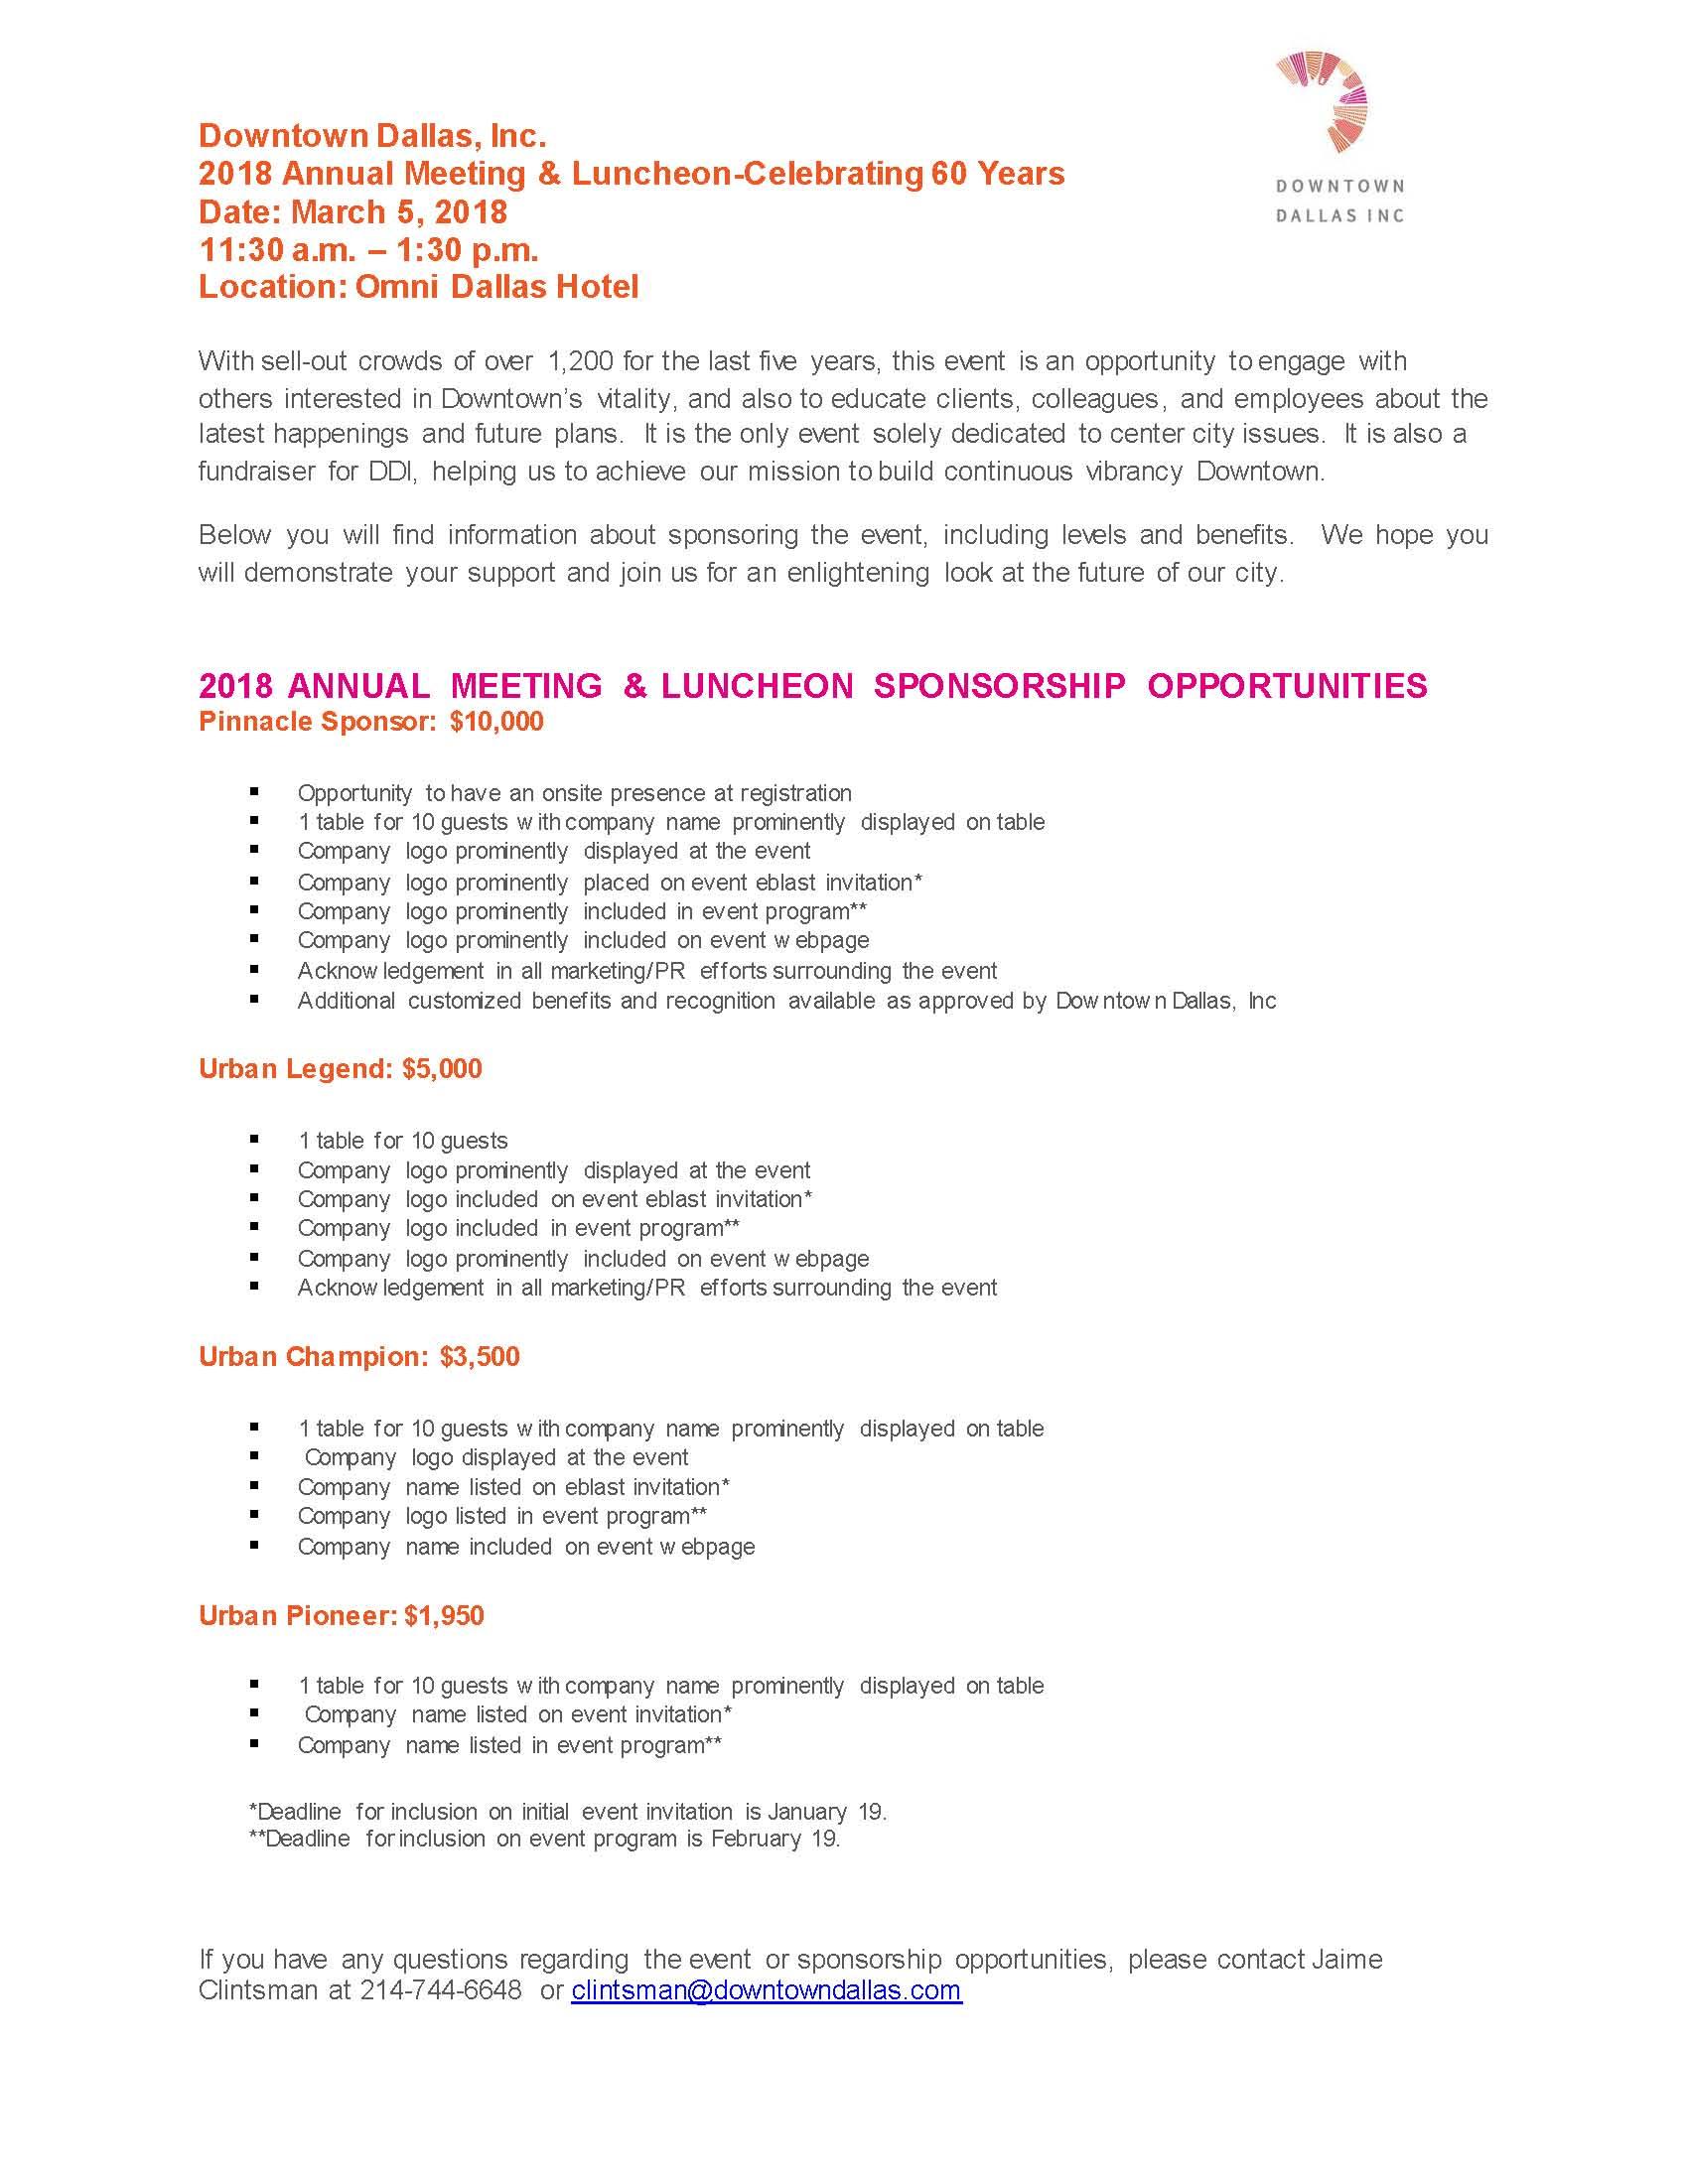 2018 DDI Annual Meeting_Sponsorship Opportunities 1918